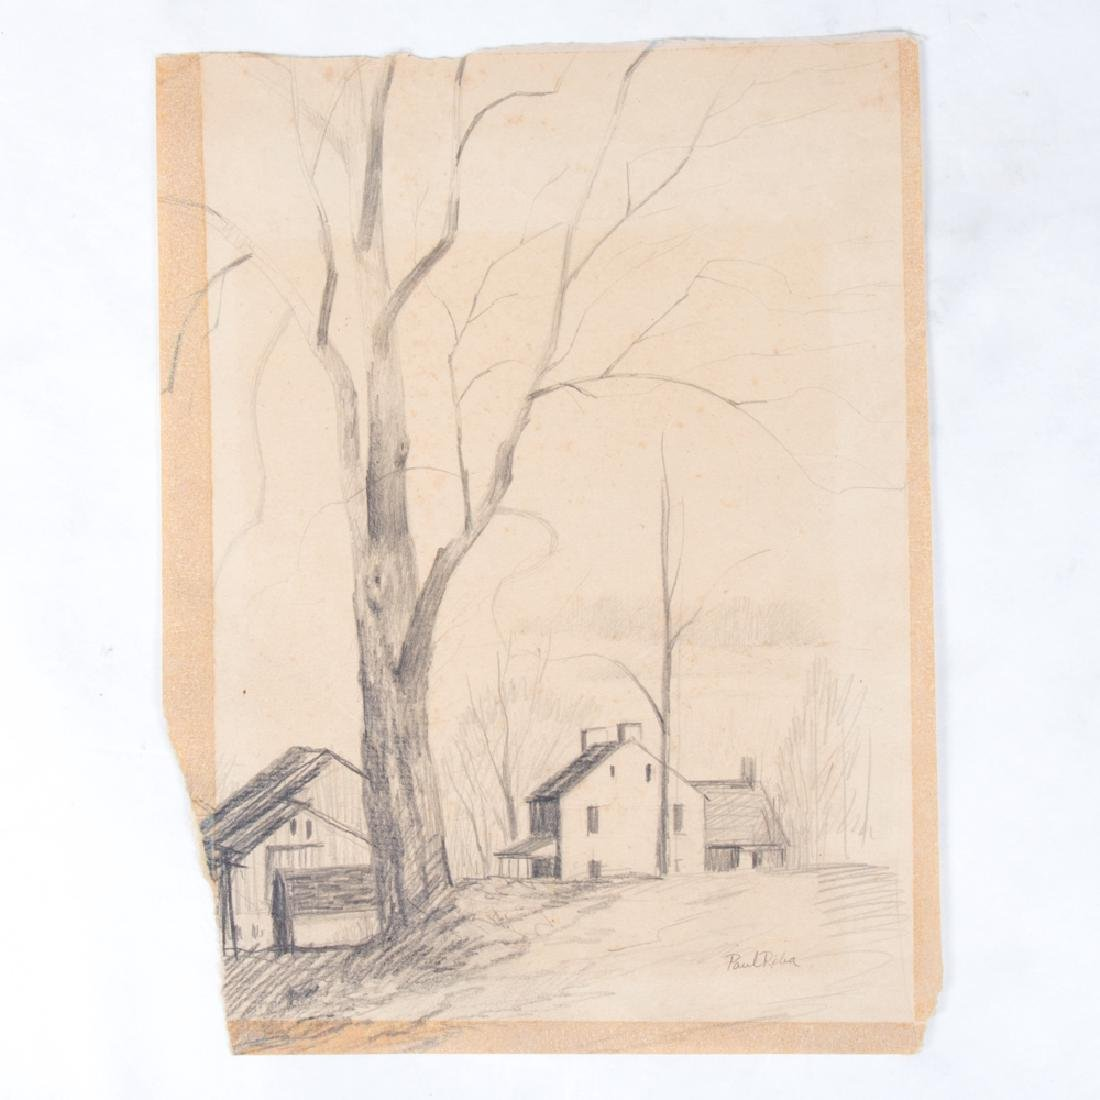 Paul Riba (1912-1977) A Group of Three Studies, Pencil - 2